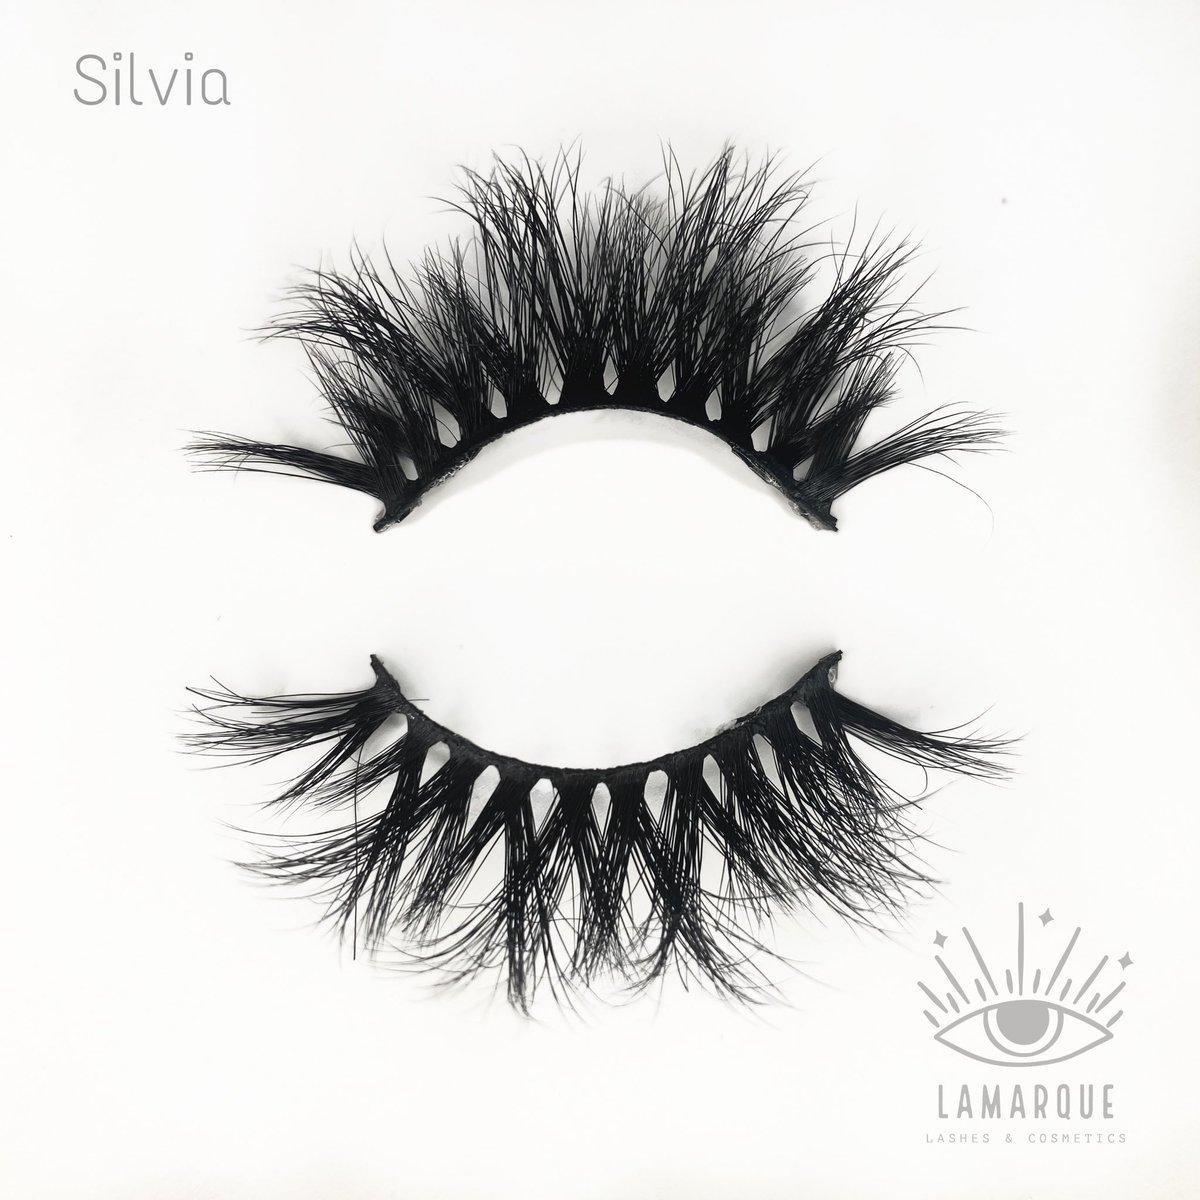 "⚜️Introducing Our Lash In The Style ""Silvia"" Launching soon ⚜️ #eyelashes #lashesfordays #falselashes #shopsmall https://t.co/Kf6hLNkbMG"